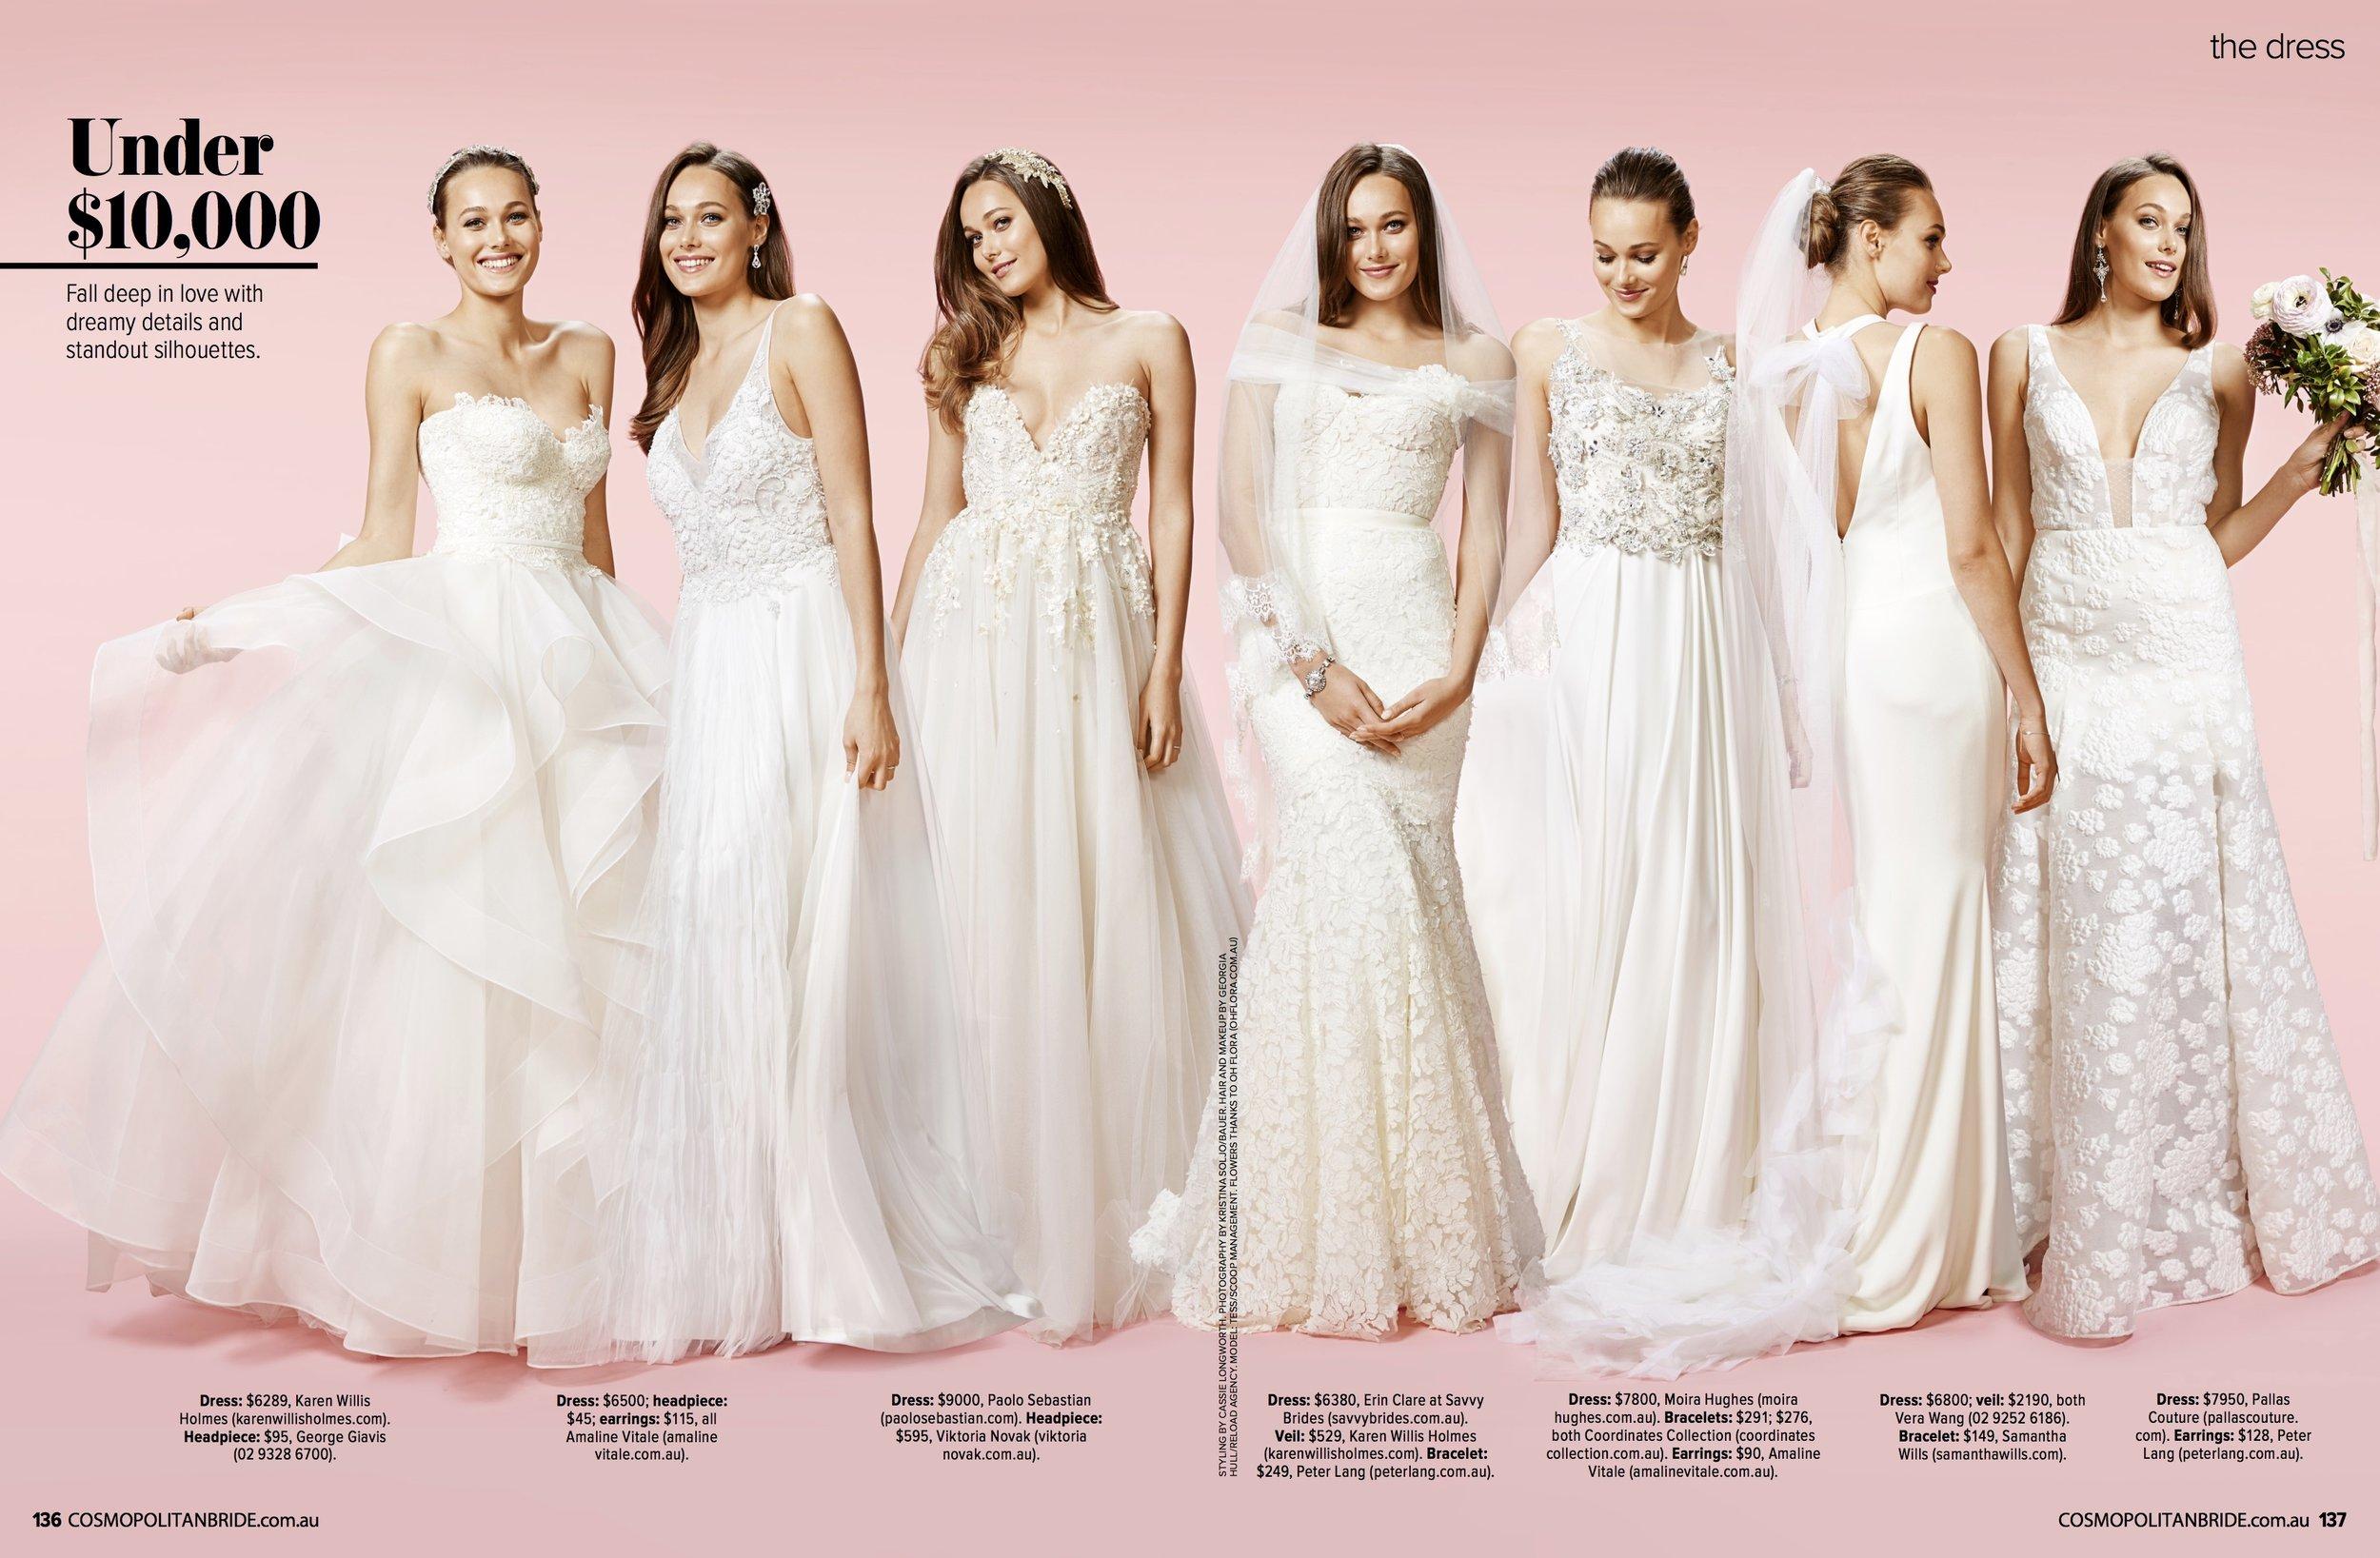 Cosmopolitan Bride Magazine - The Dress 2015